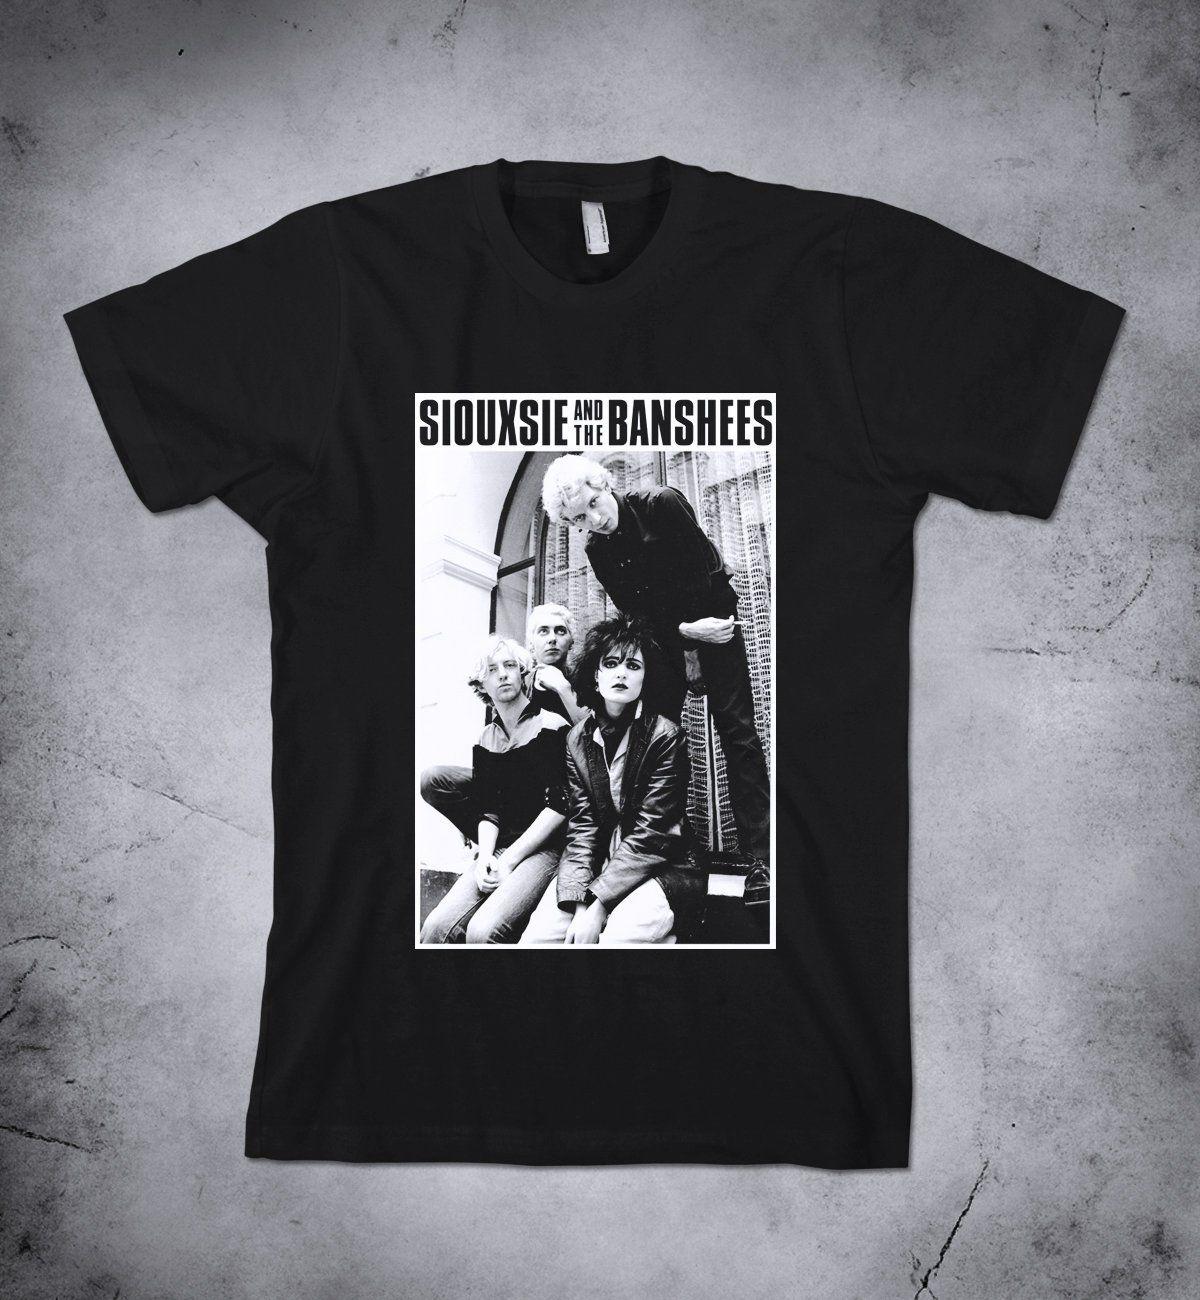 SIOUXSIE Banshees punk rock retro T shirt ALL SIZES